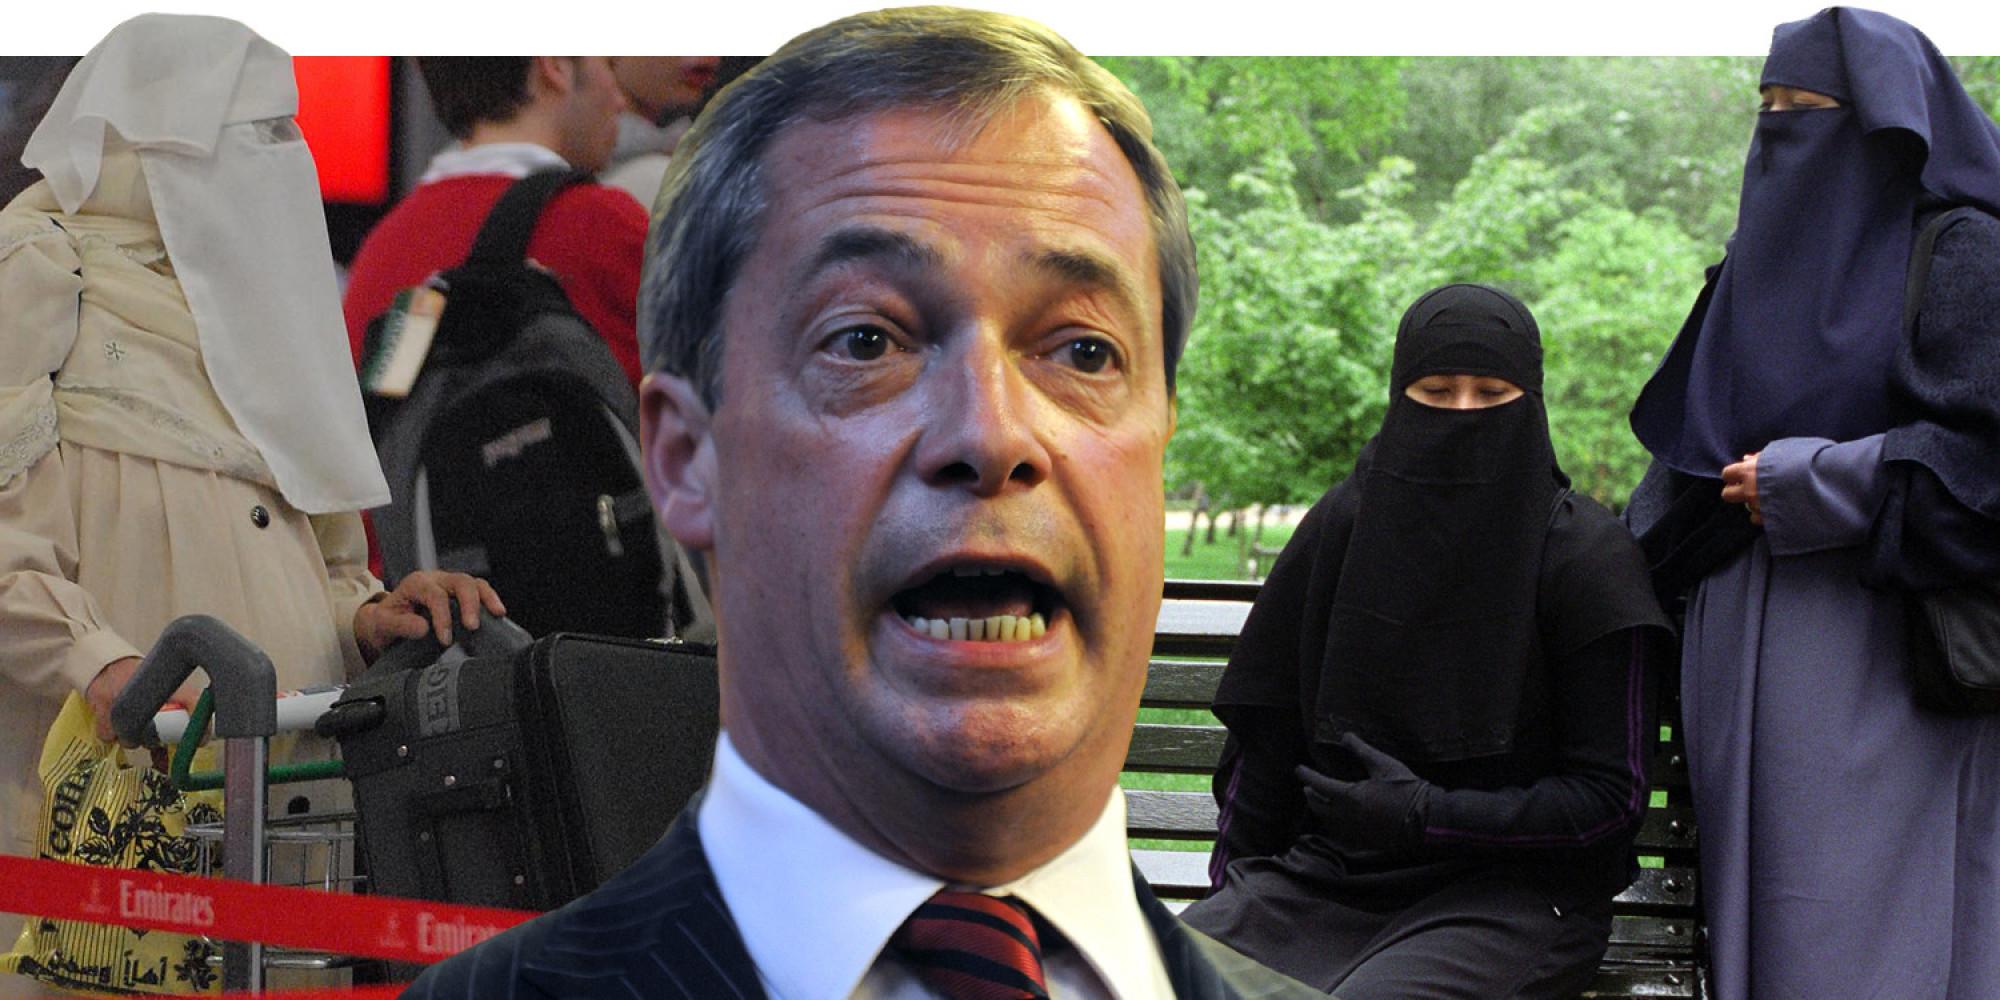 http://i.huffpost.com/gen/1389588/thumbs/o-NIGEL-FARAGE-UKIP-facebook.jpg